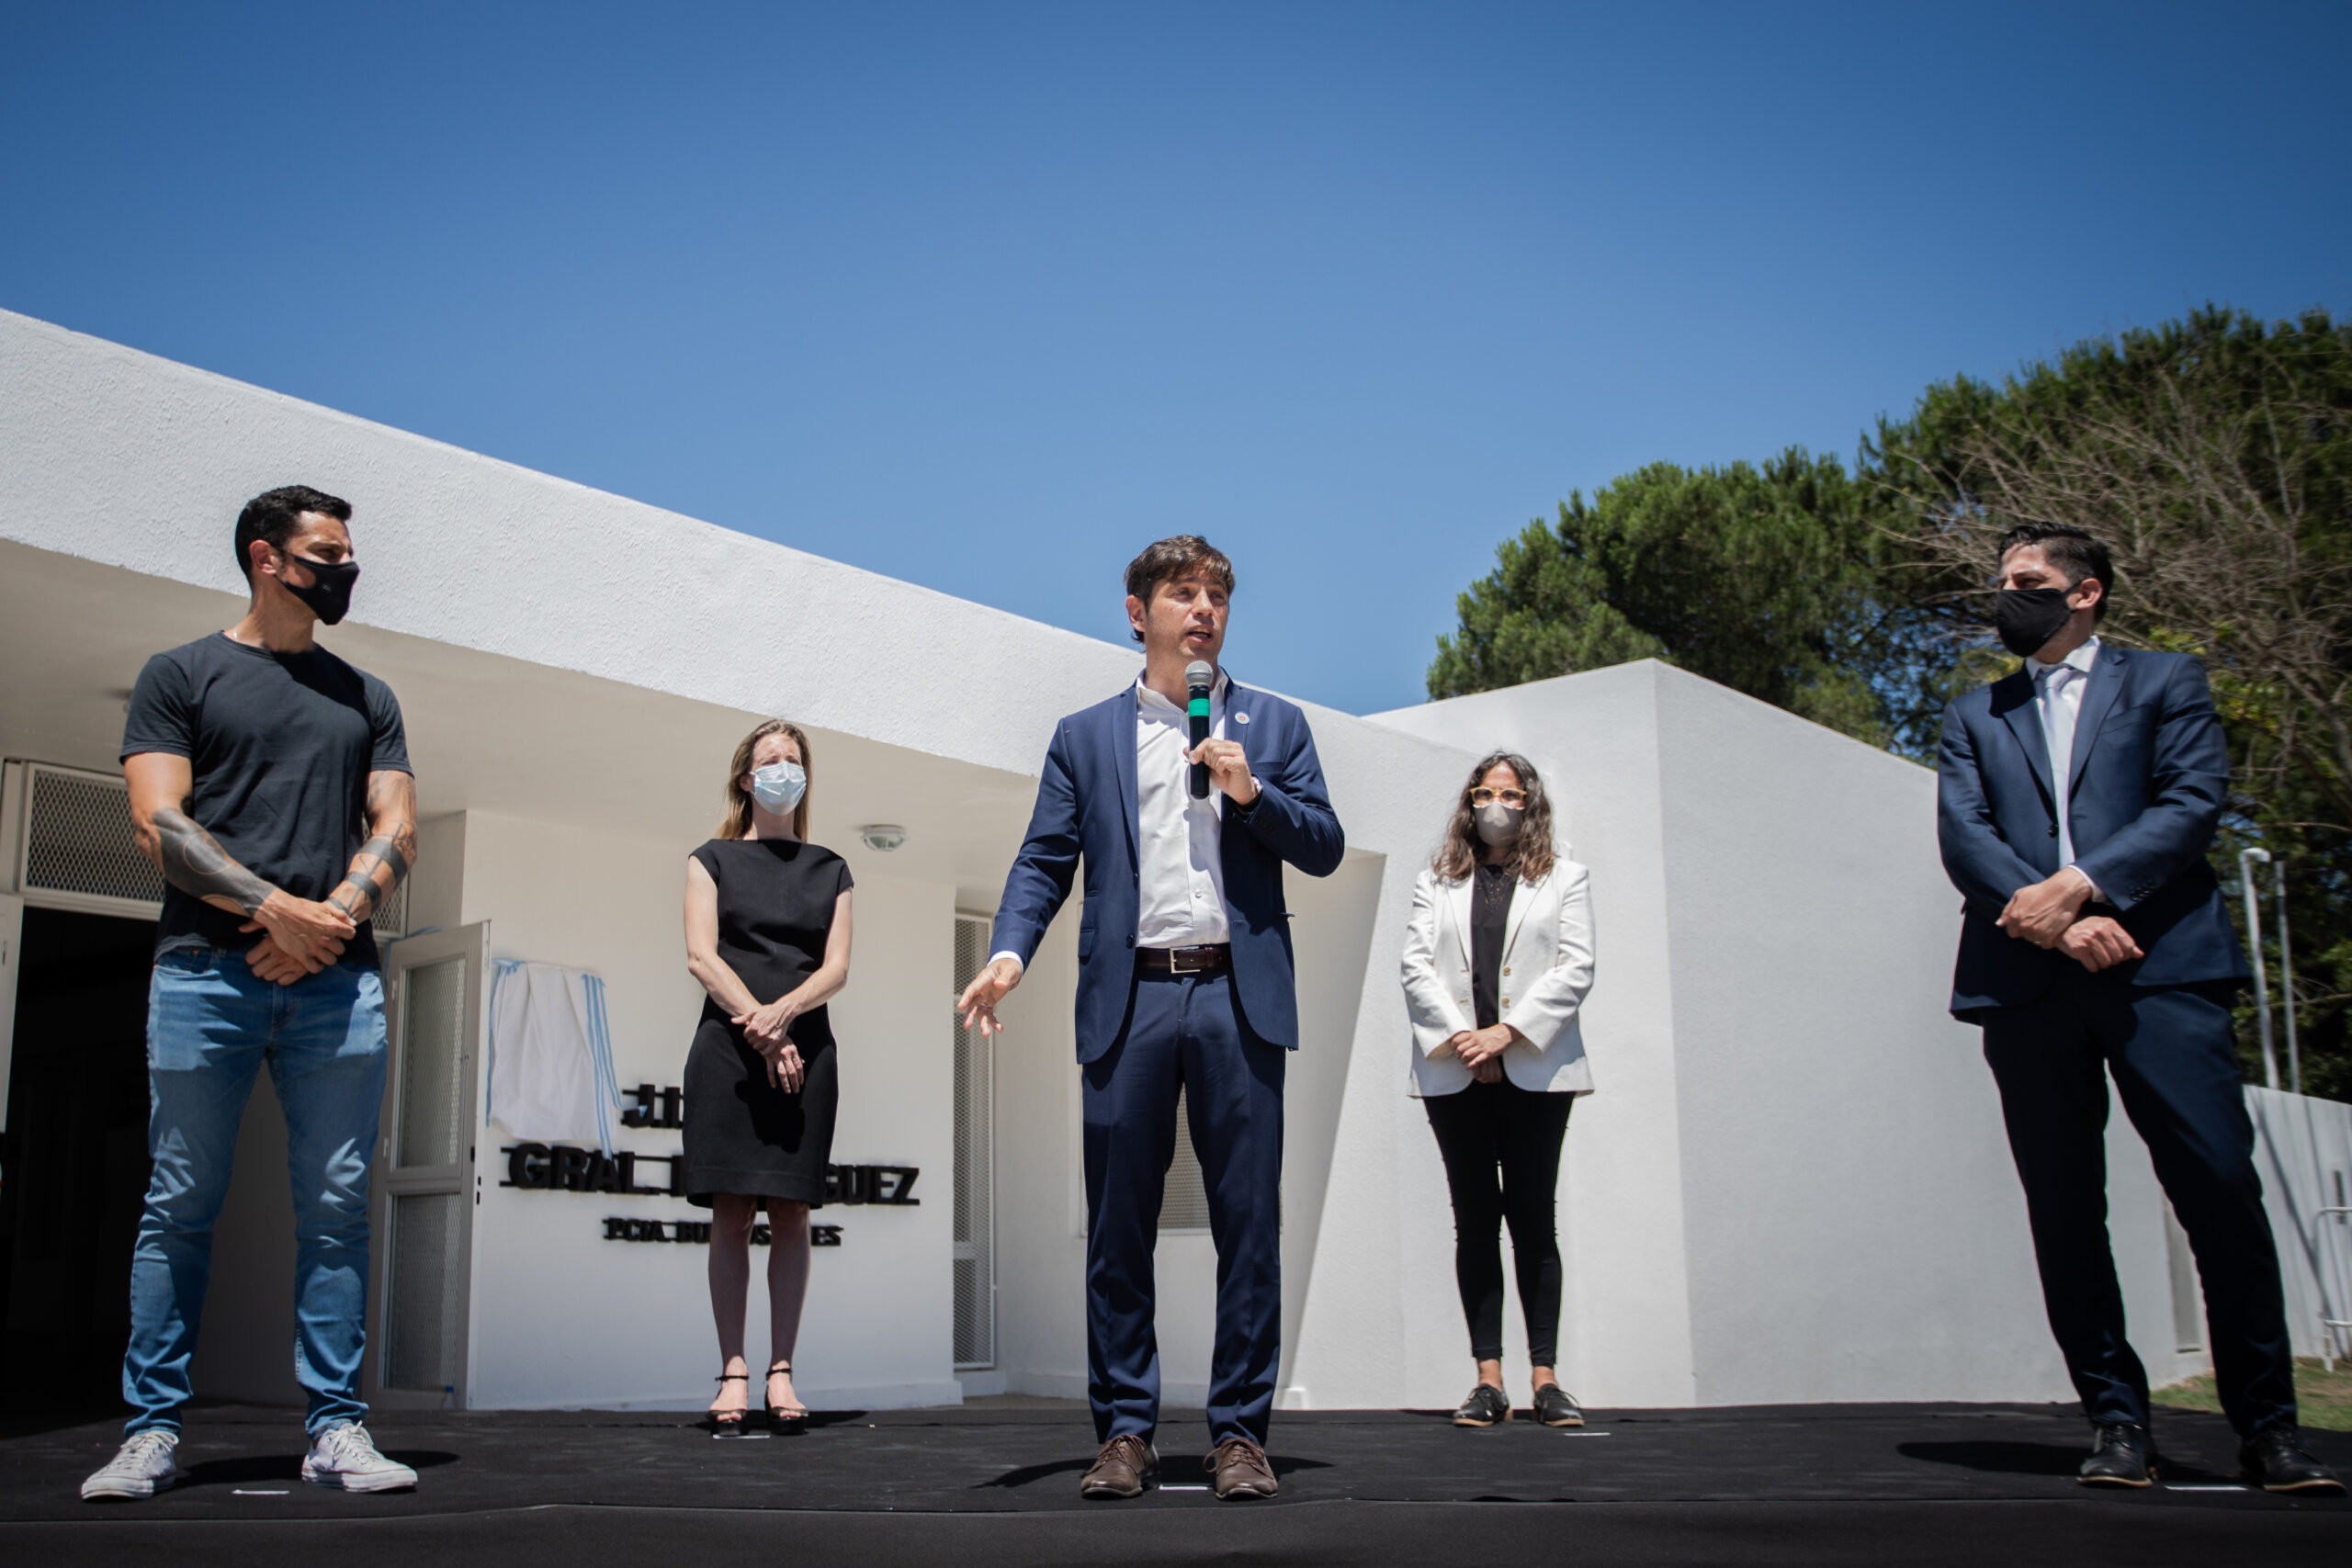 Kicillof inauguró dos jardines de infantes en General Rodríguez